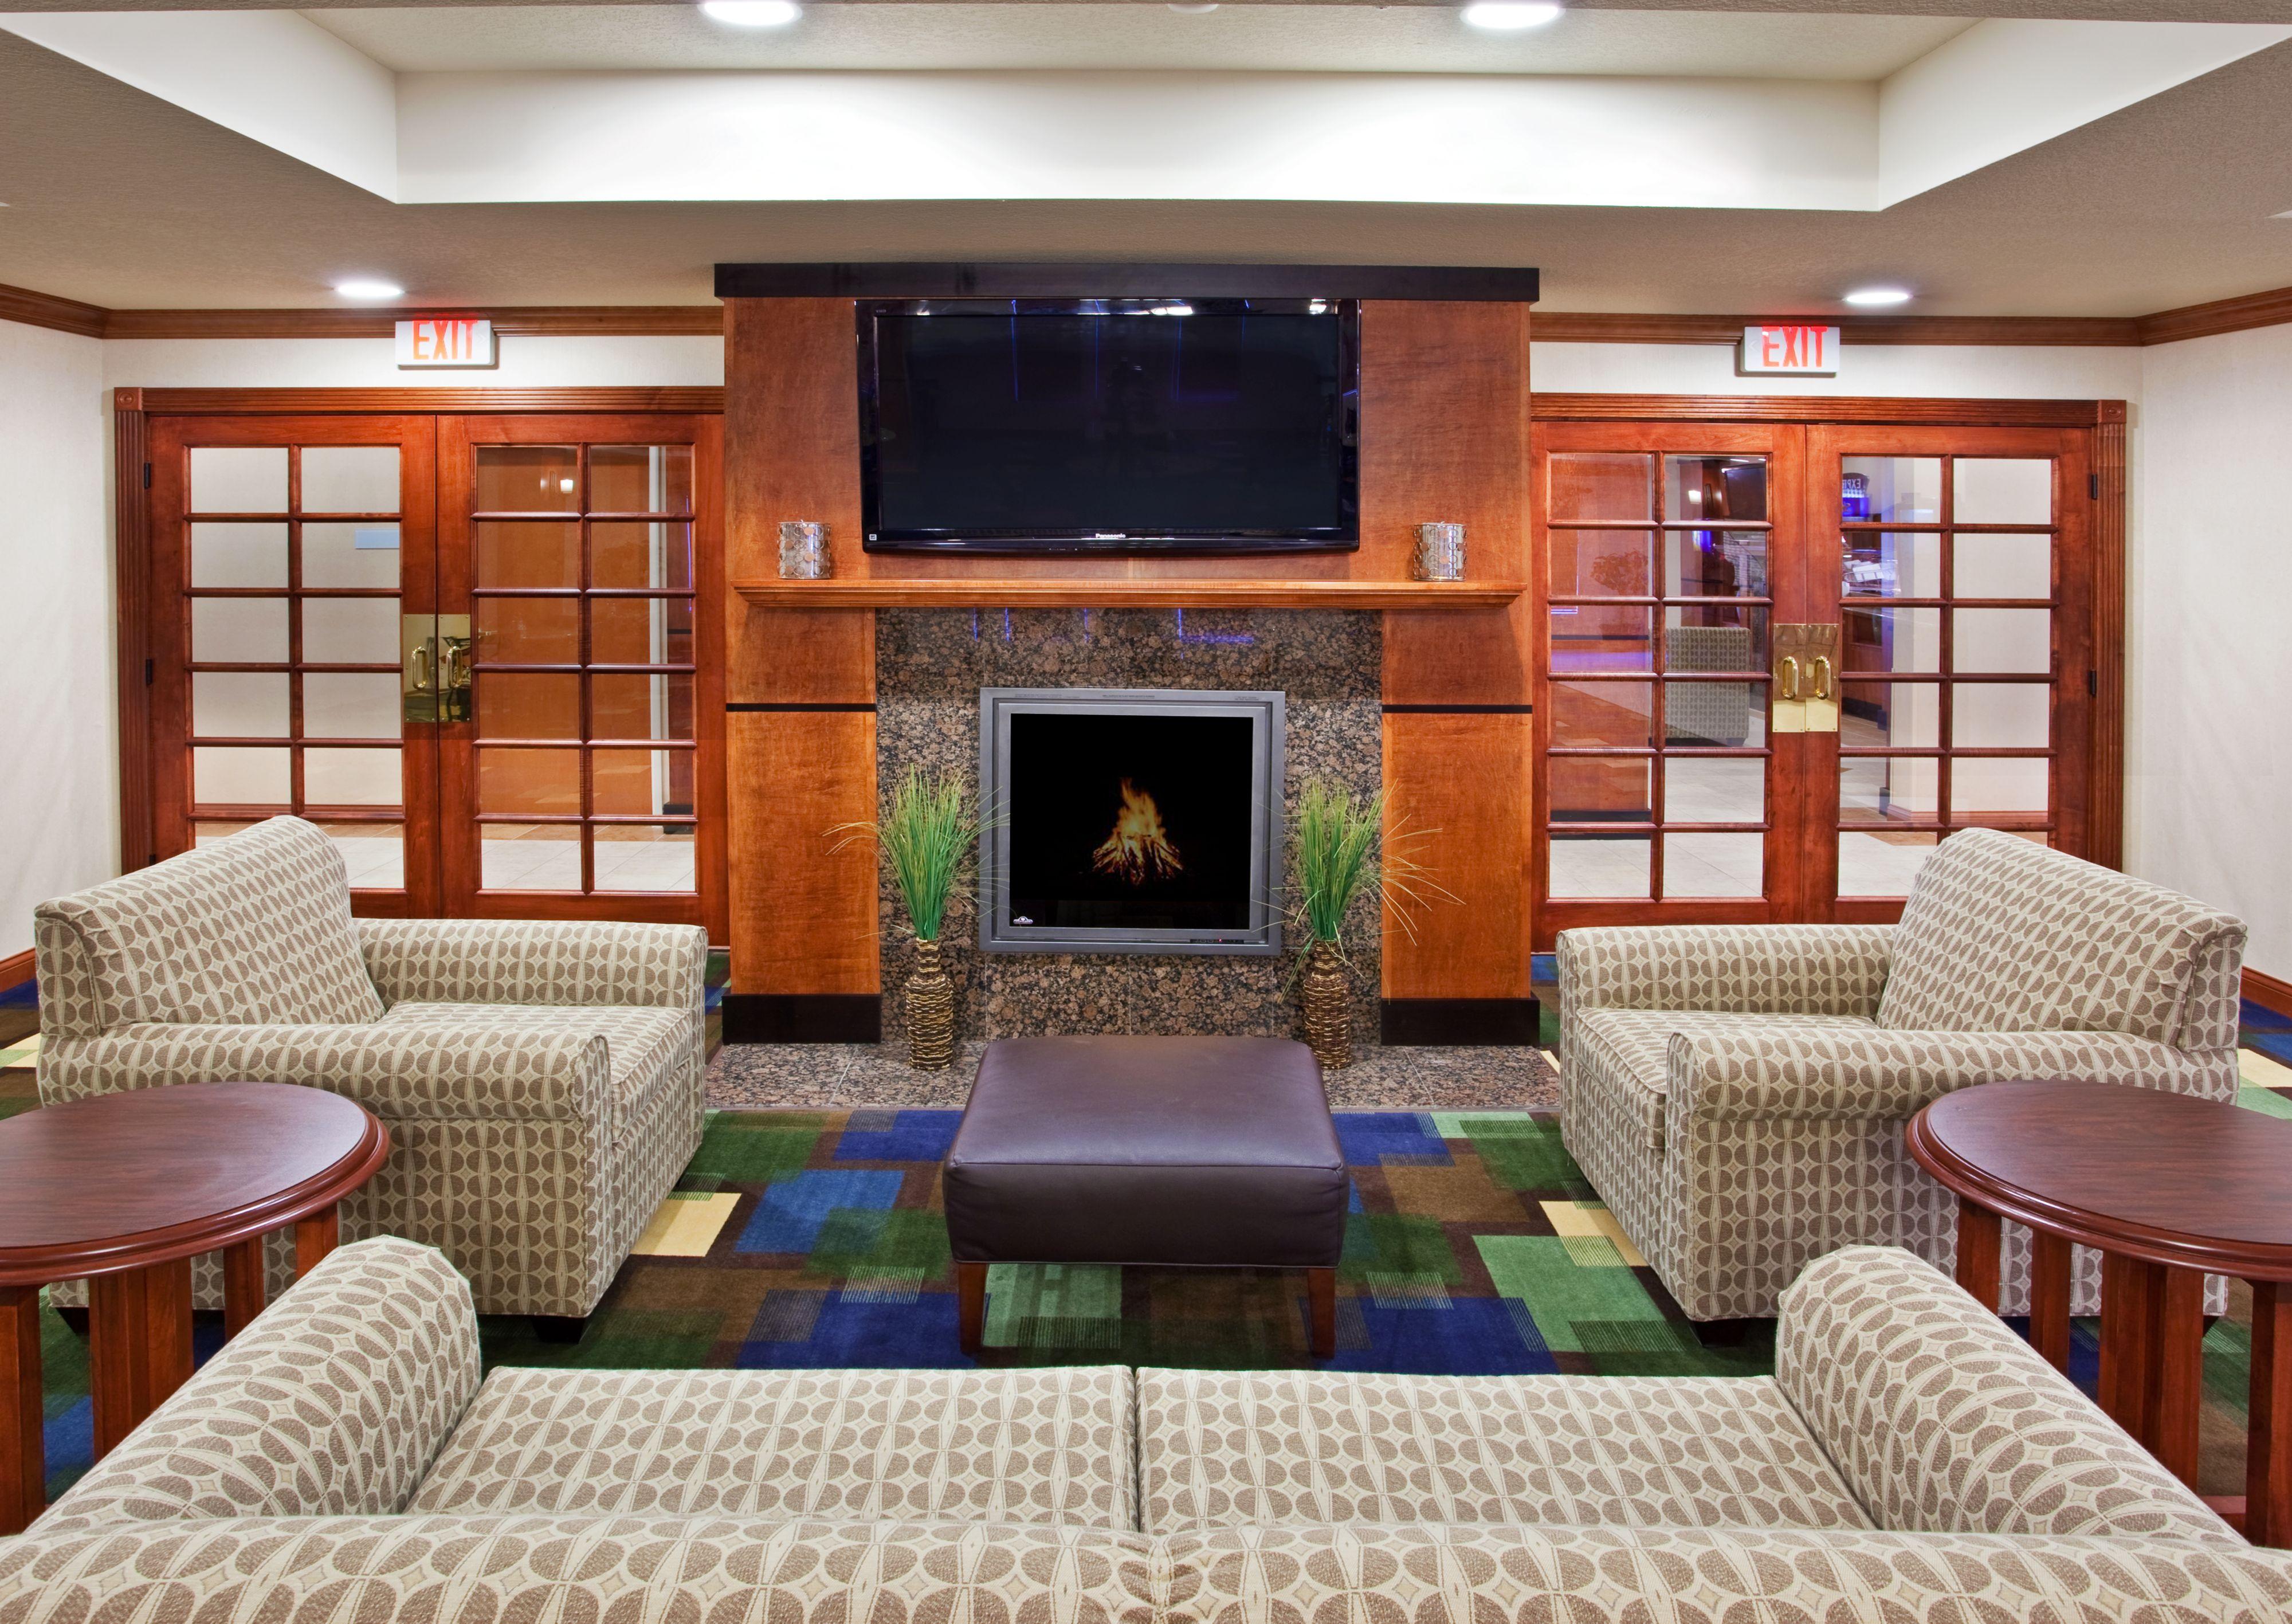 Holiday Inn Express & Suites East Lansing image 7